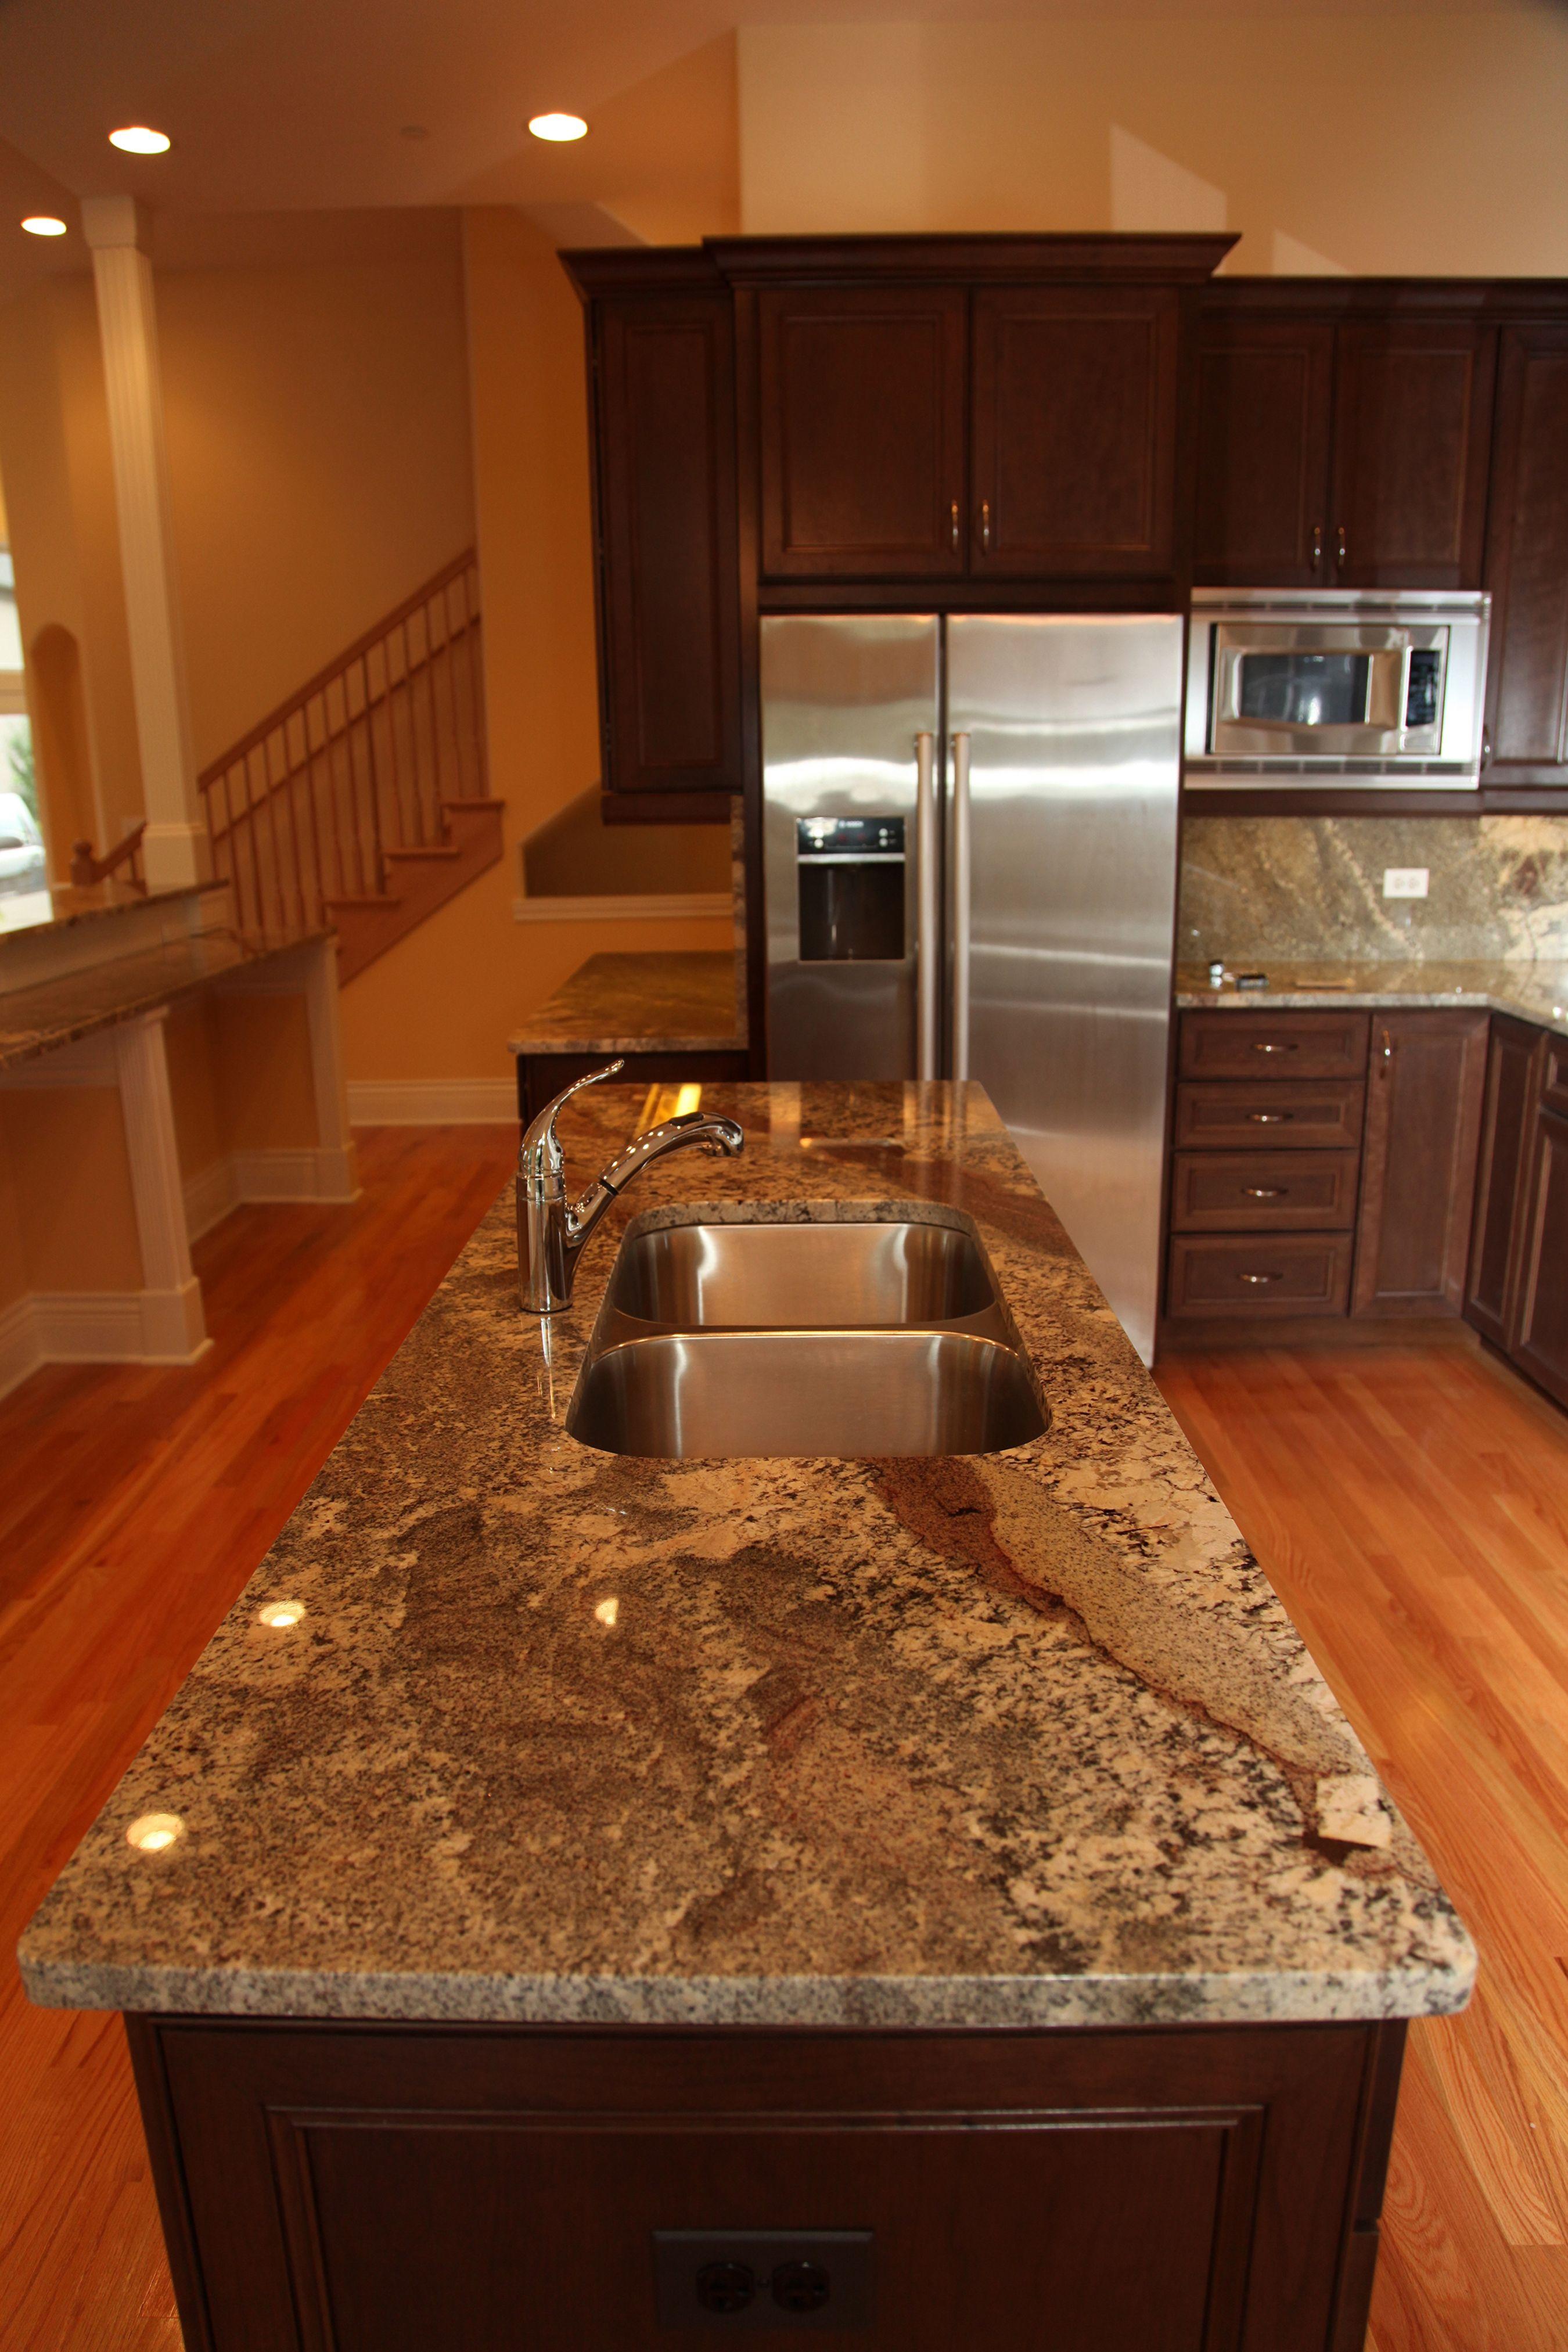 kitchens with dark cabinets and light granite | Kitchen ...